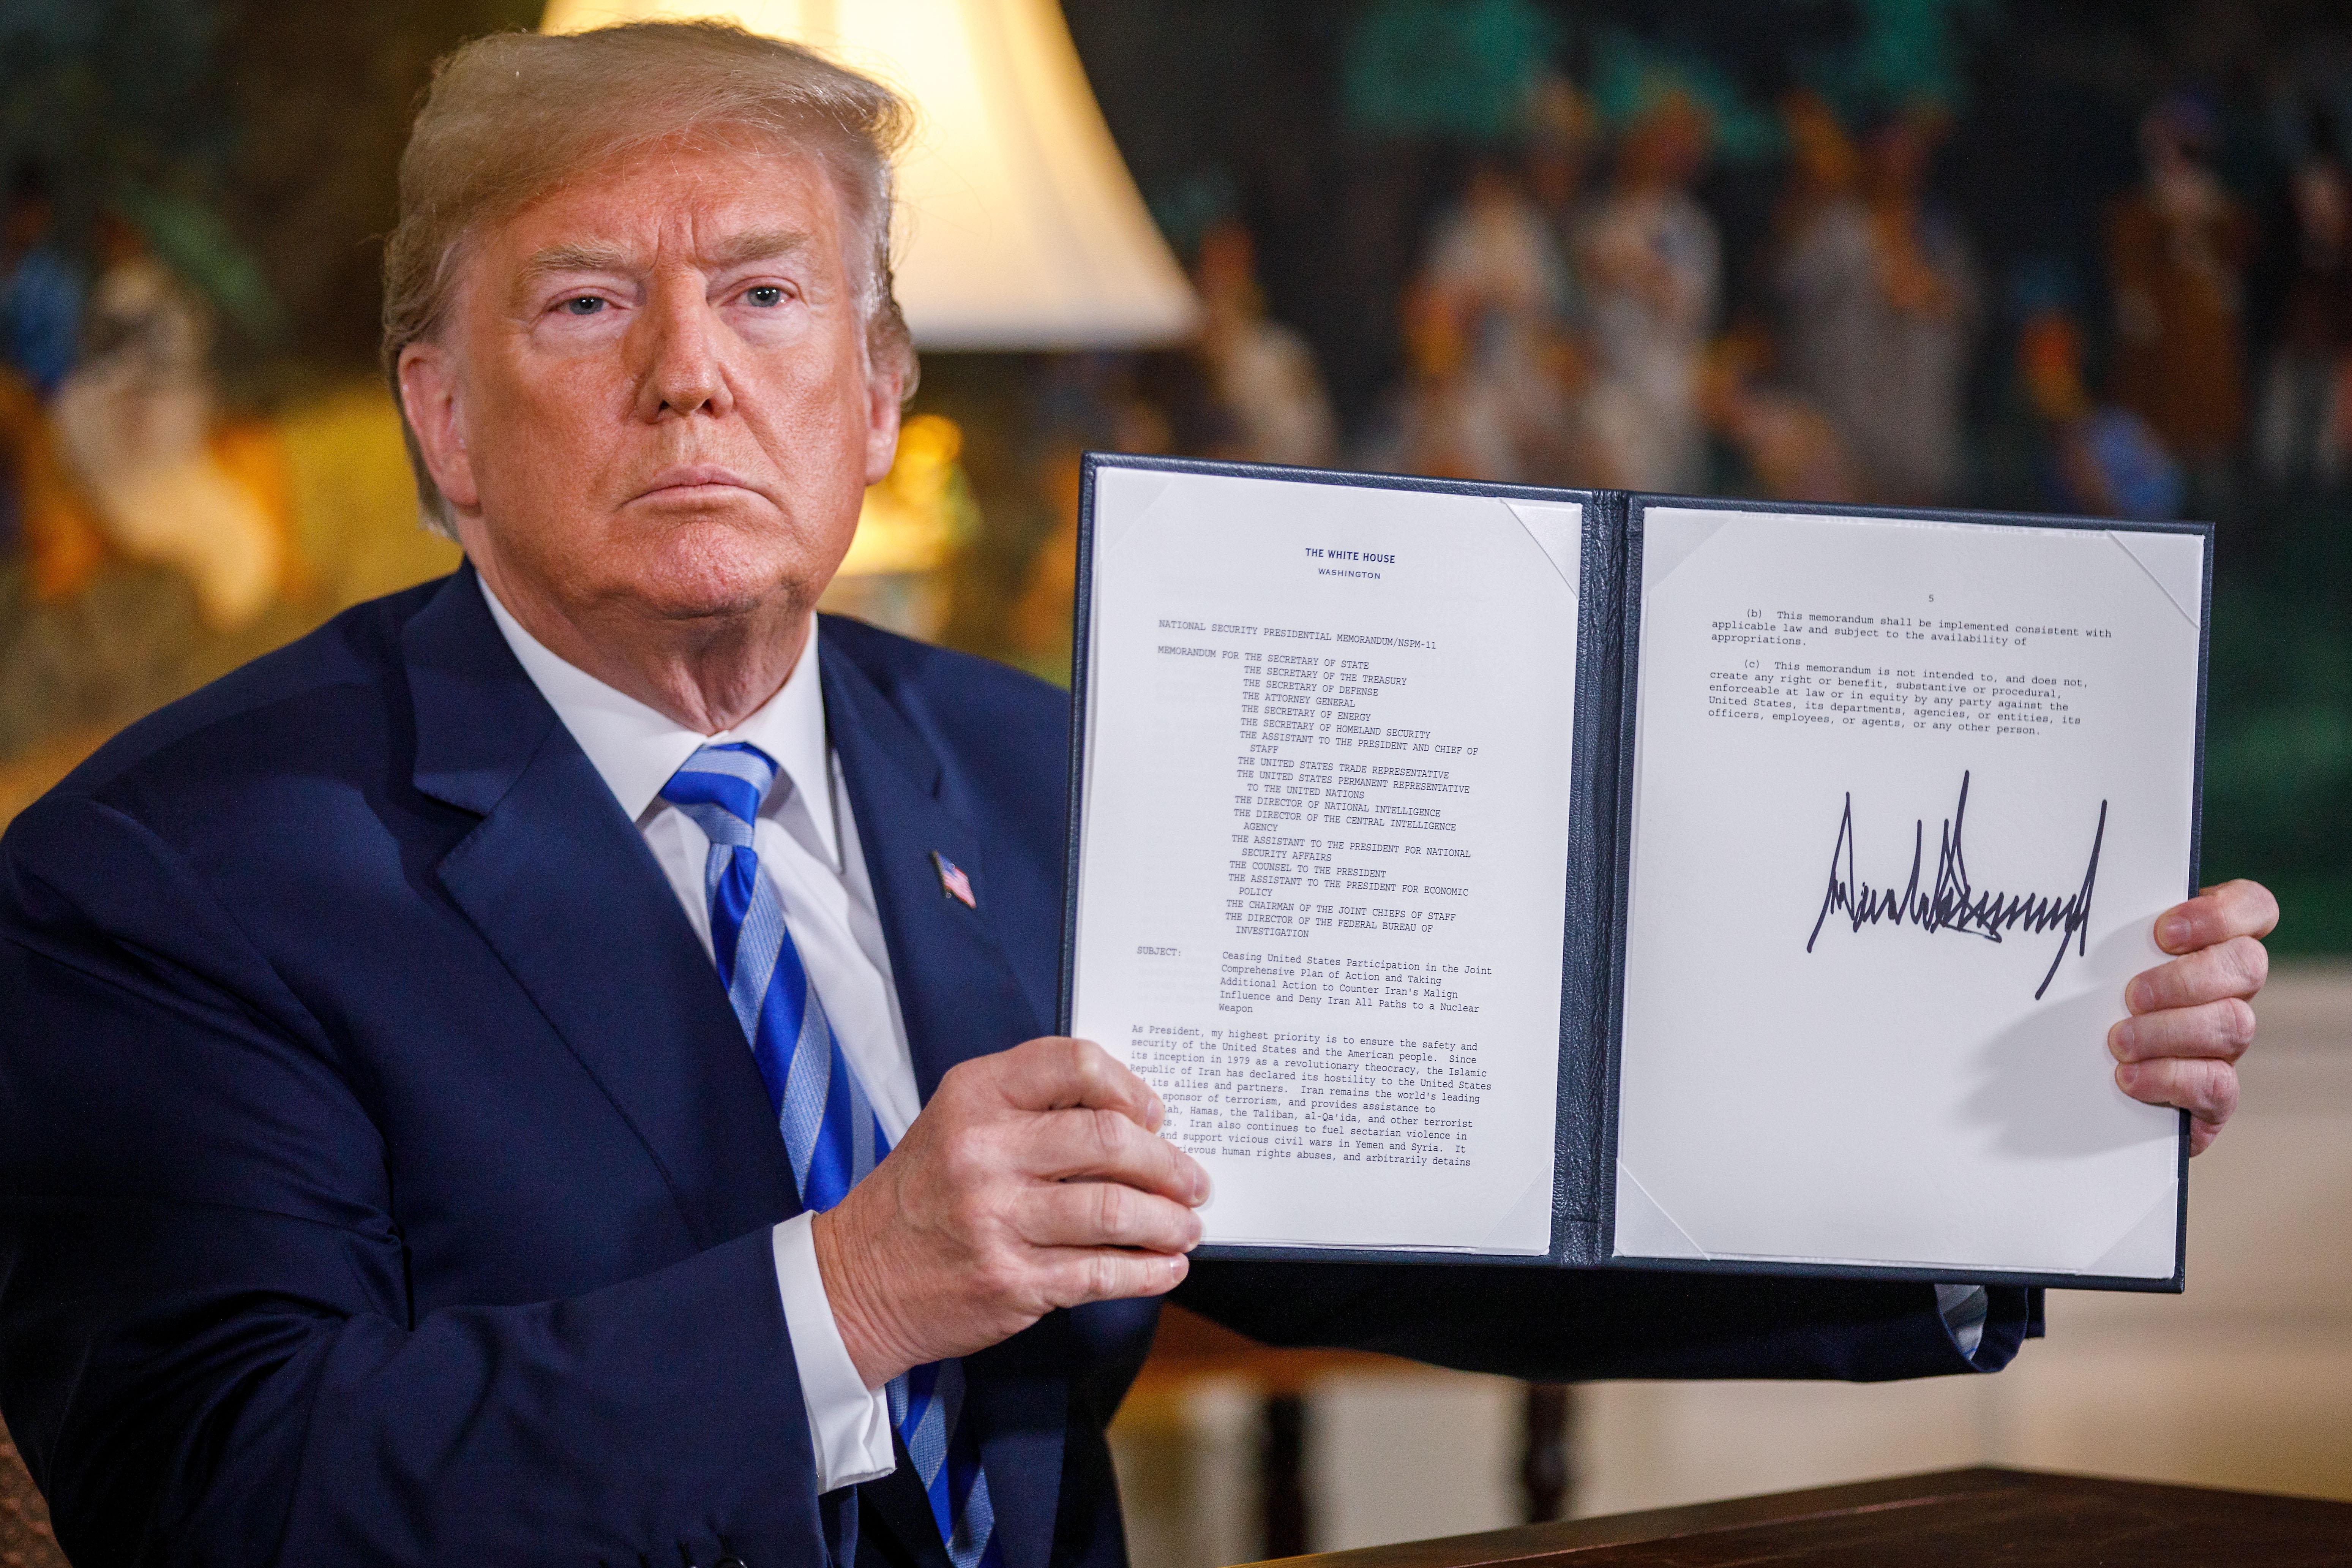 U.S.-WASHINGTON D.C.-TRUMP-IRAN NUCLEAR DEAL-WITHDRAWAL